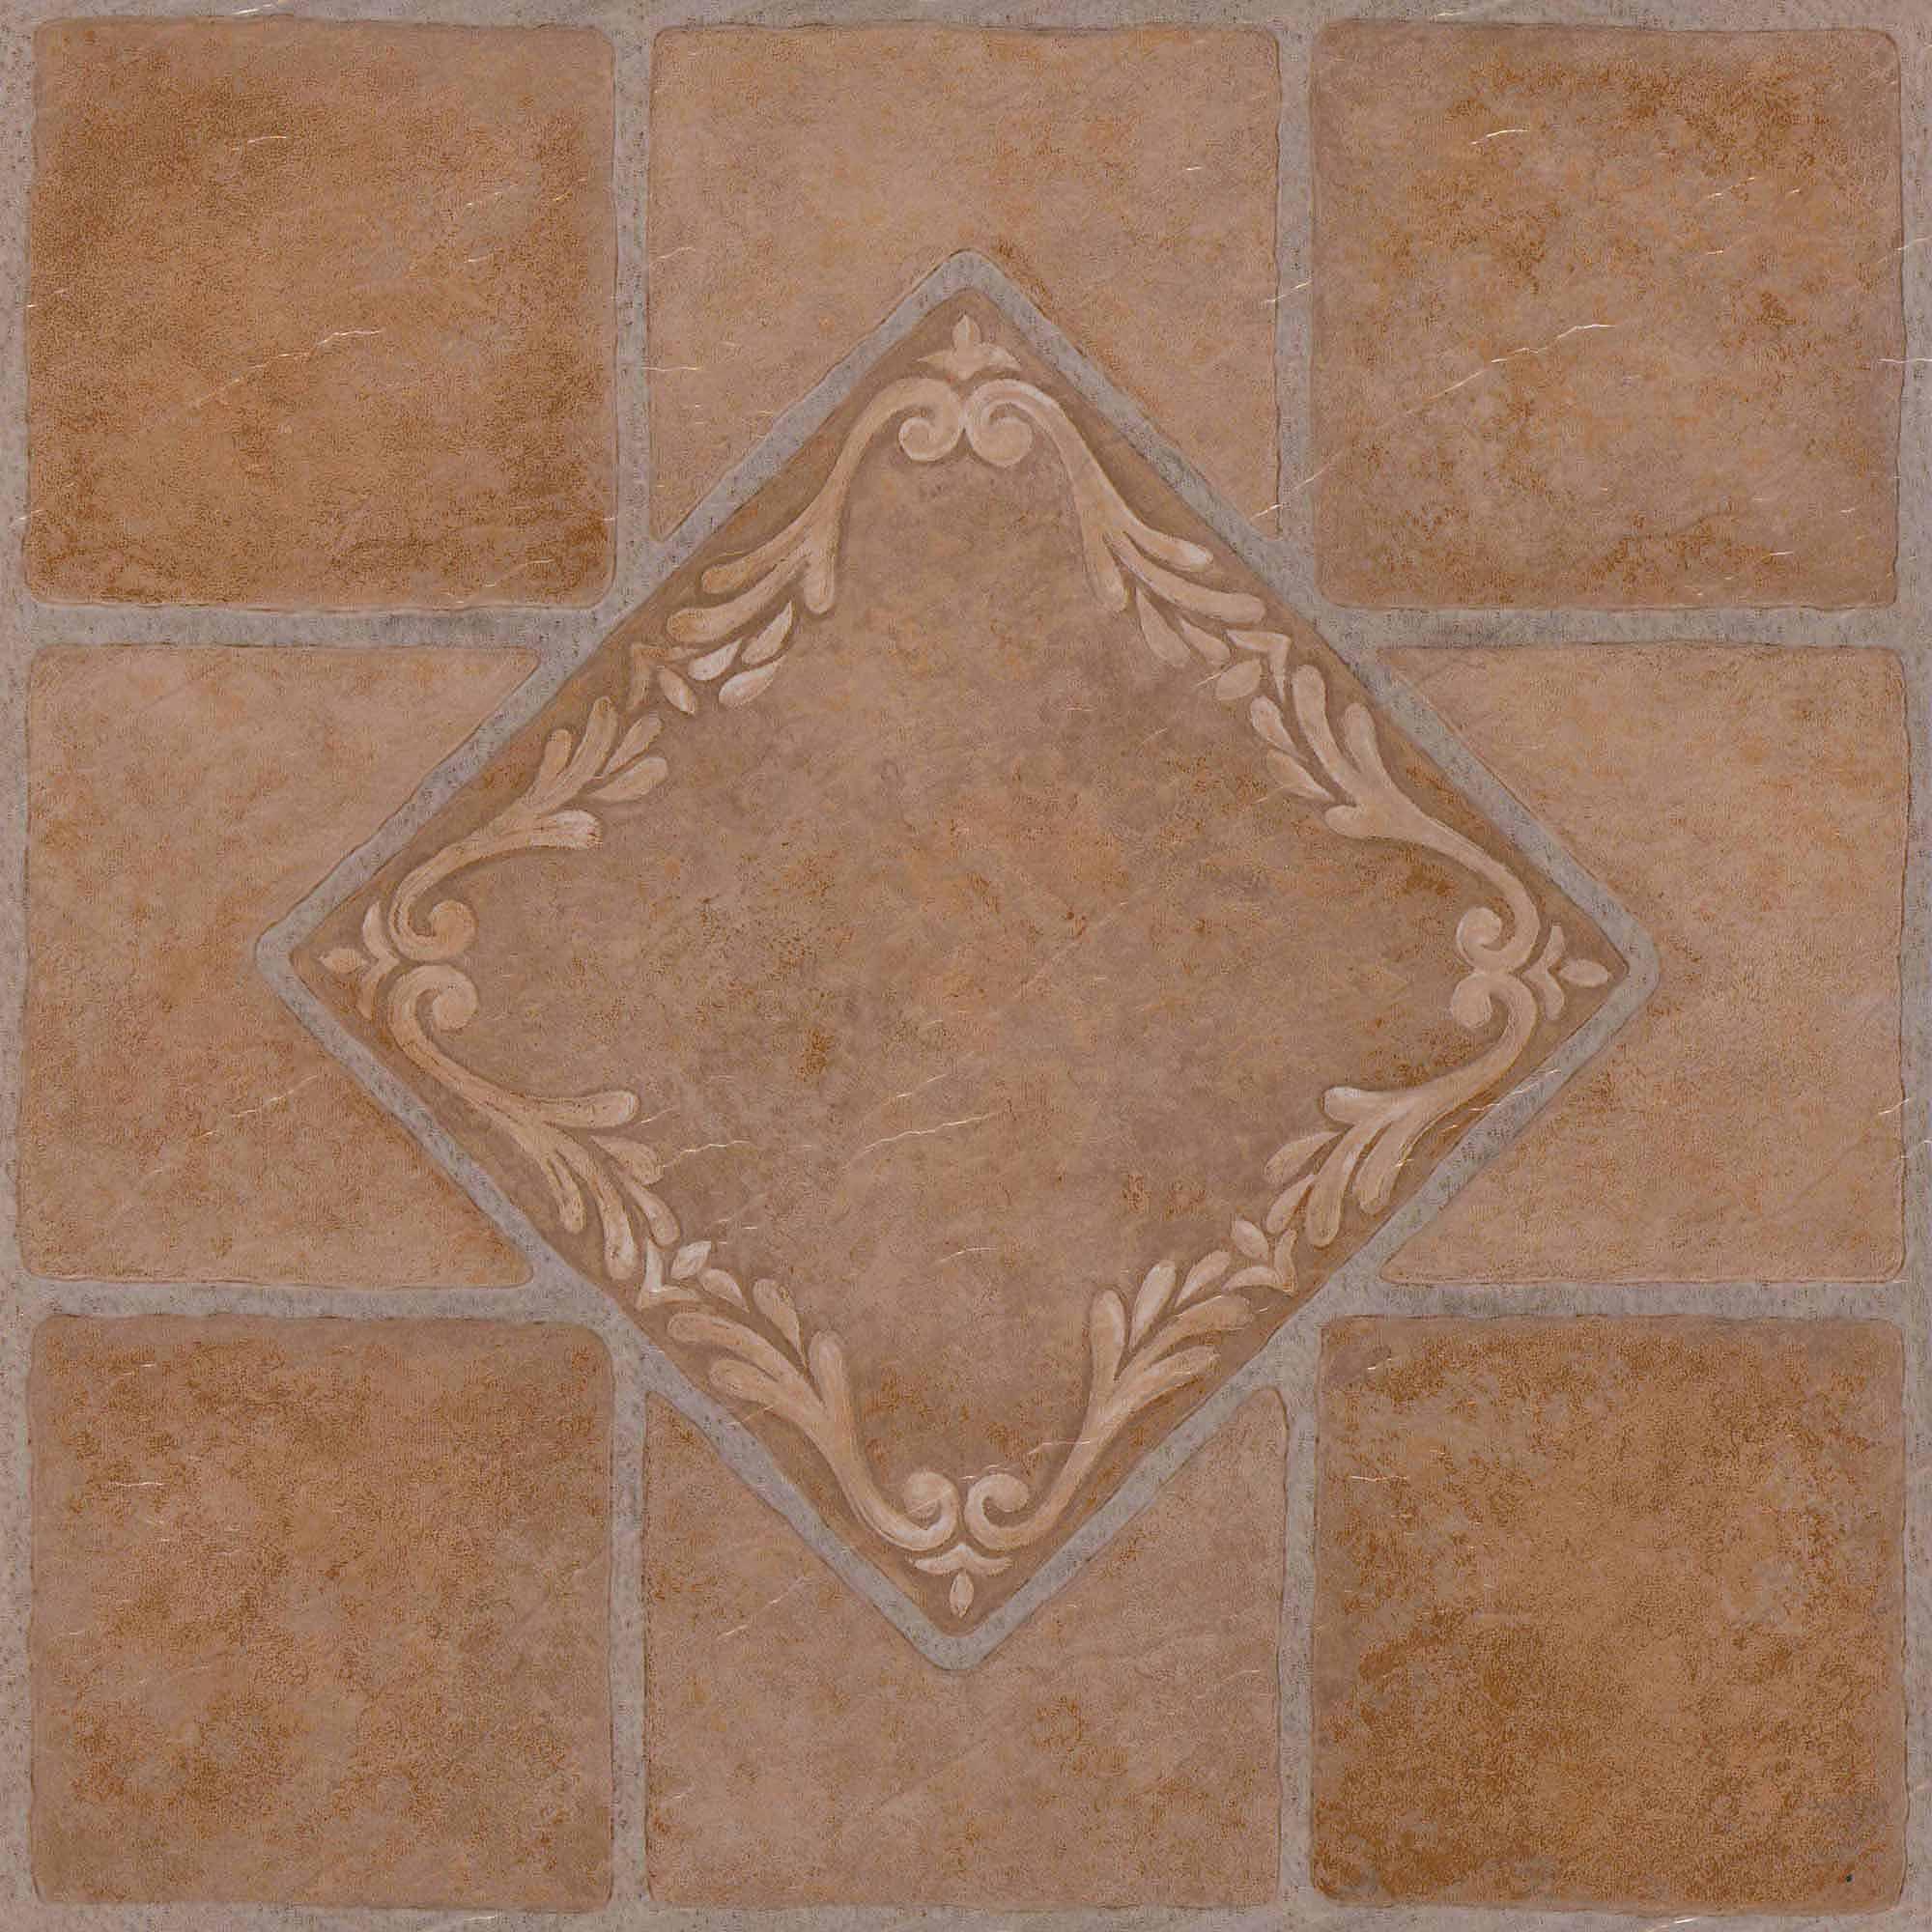 NEXUS South West Ceramic X Self Adhesive Vinyl Floor Tile - 12 inch ceramic floor tiles